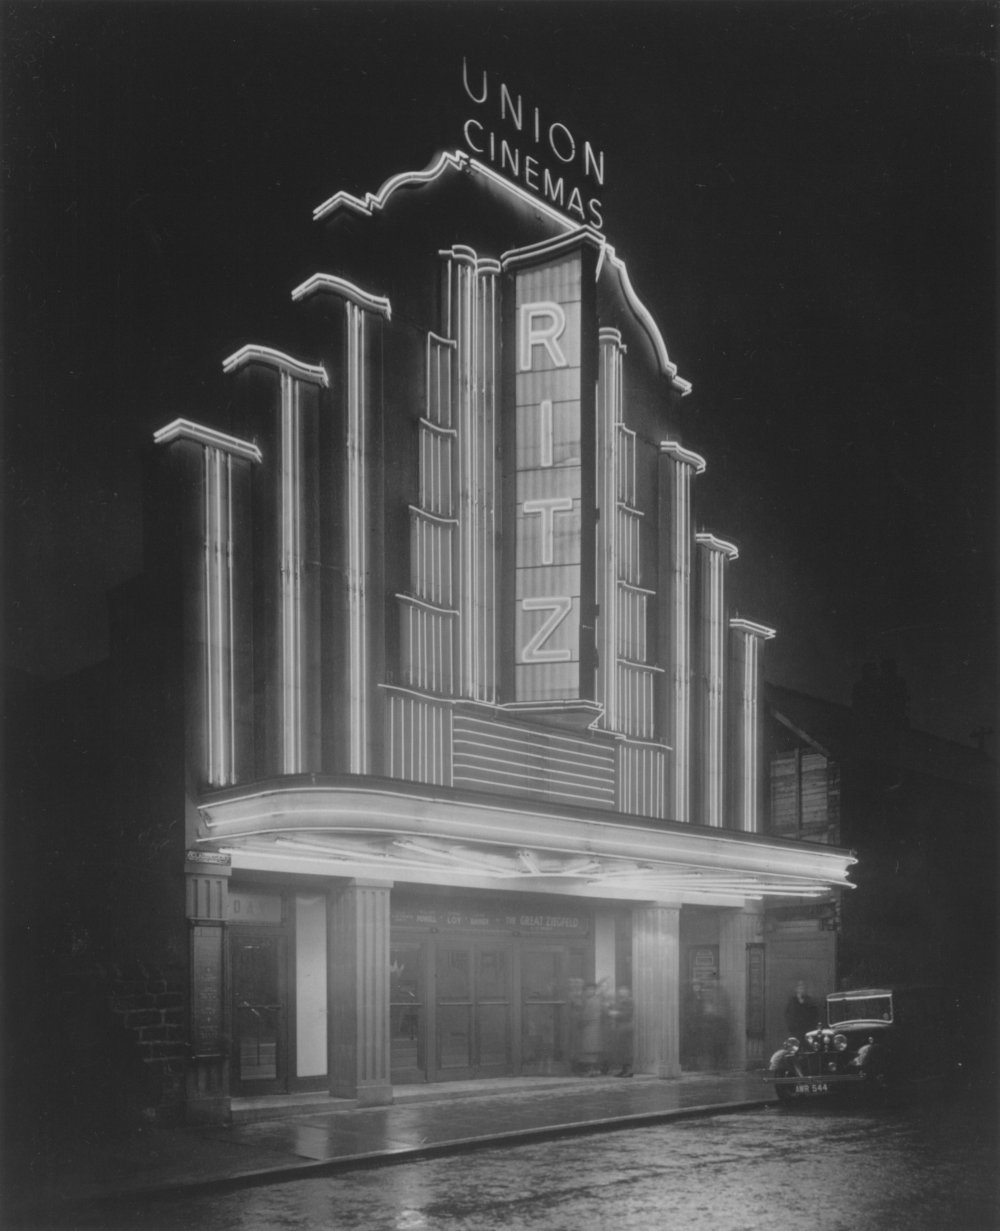 The Ritz, Barnsley, 1937